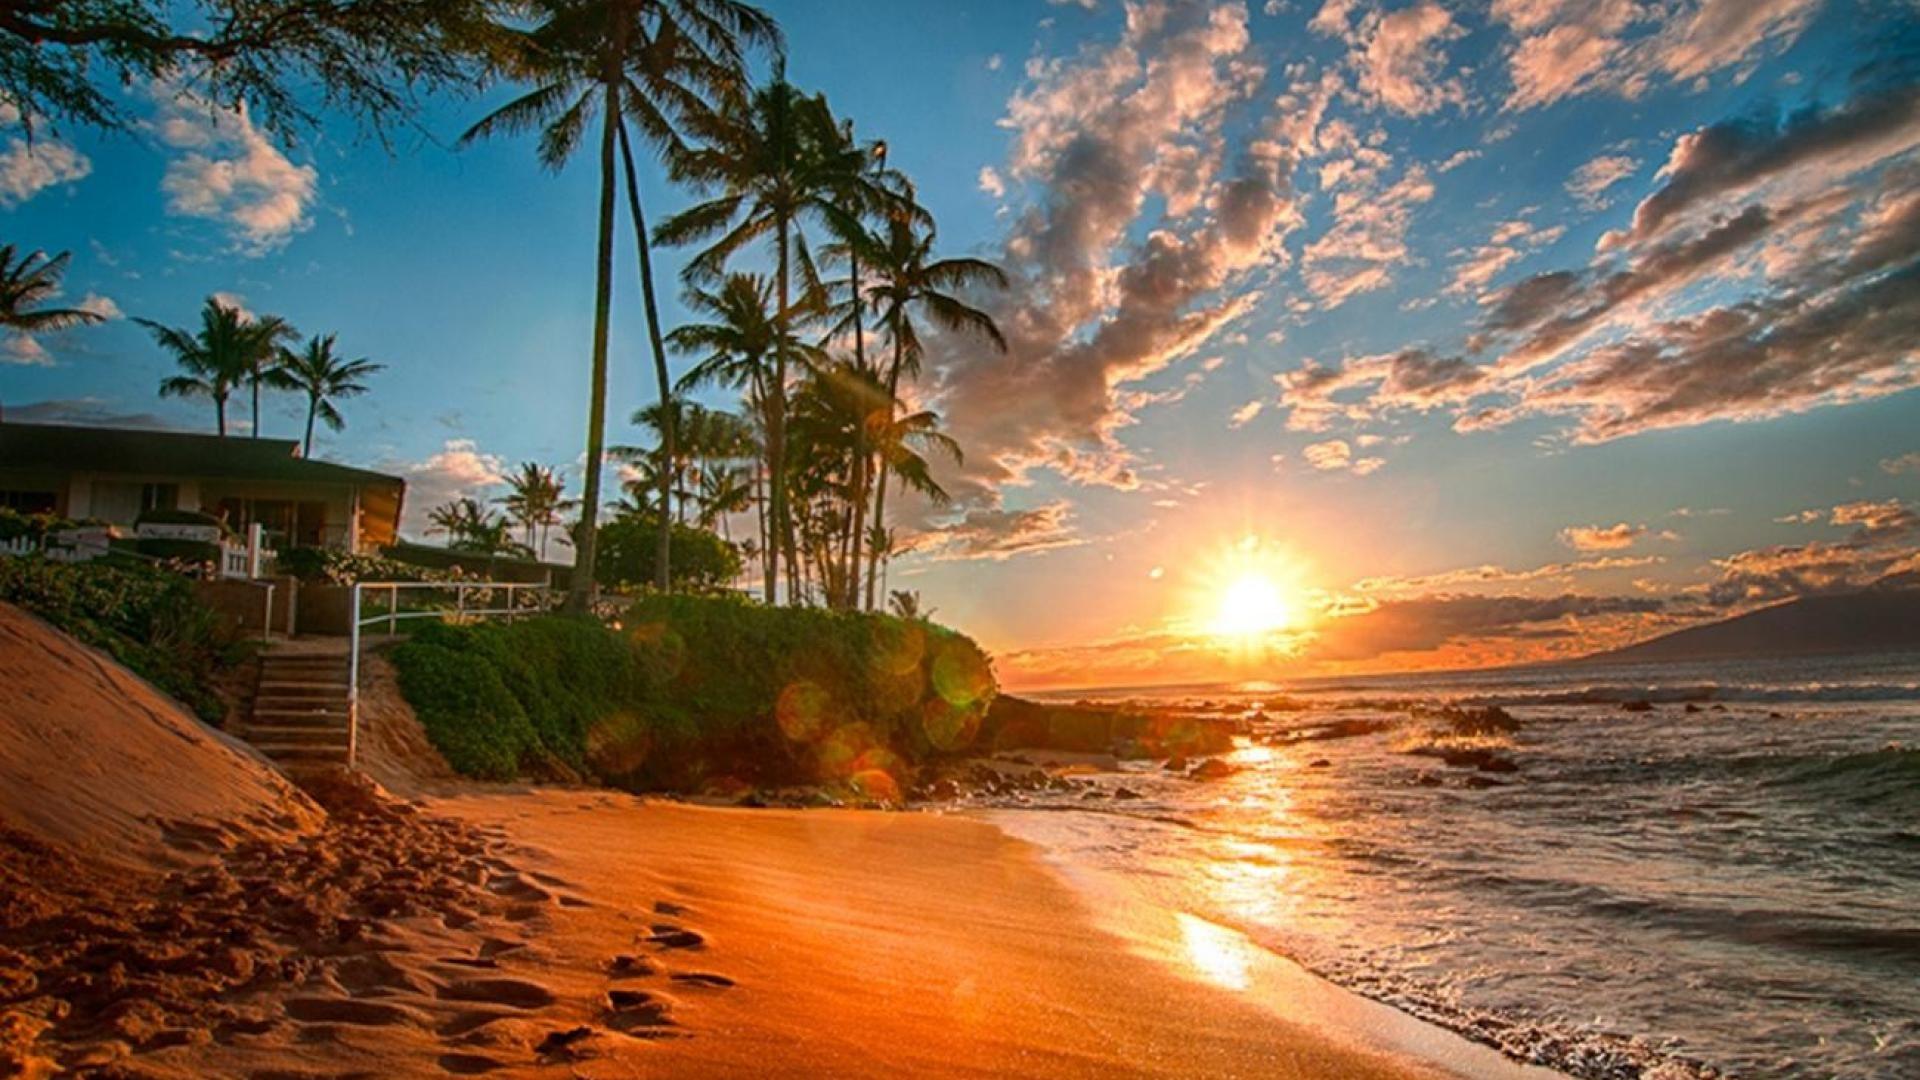 HD Wallpaper Hawaii Images Download.